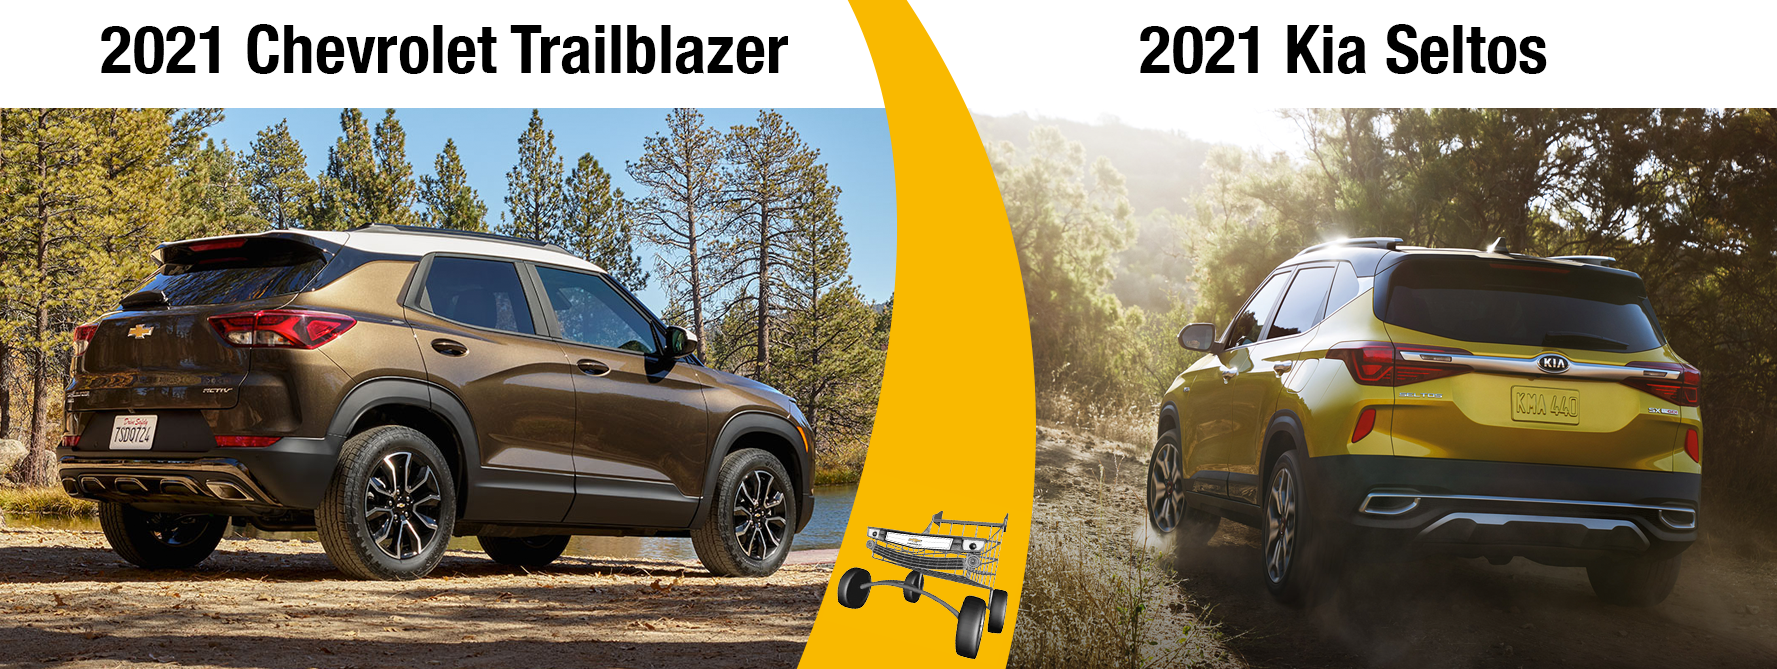 2021 Trailblazer vs 2021 Seltos Which To Buy?